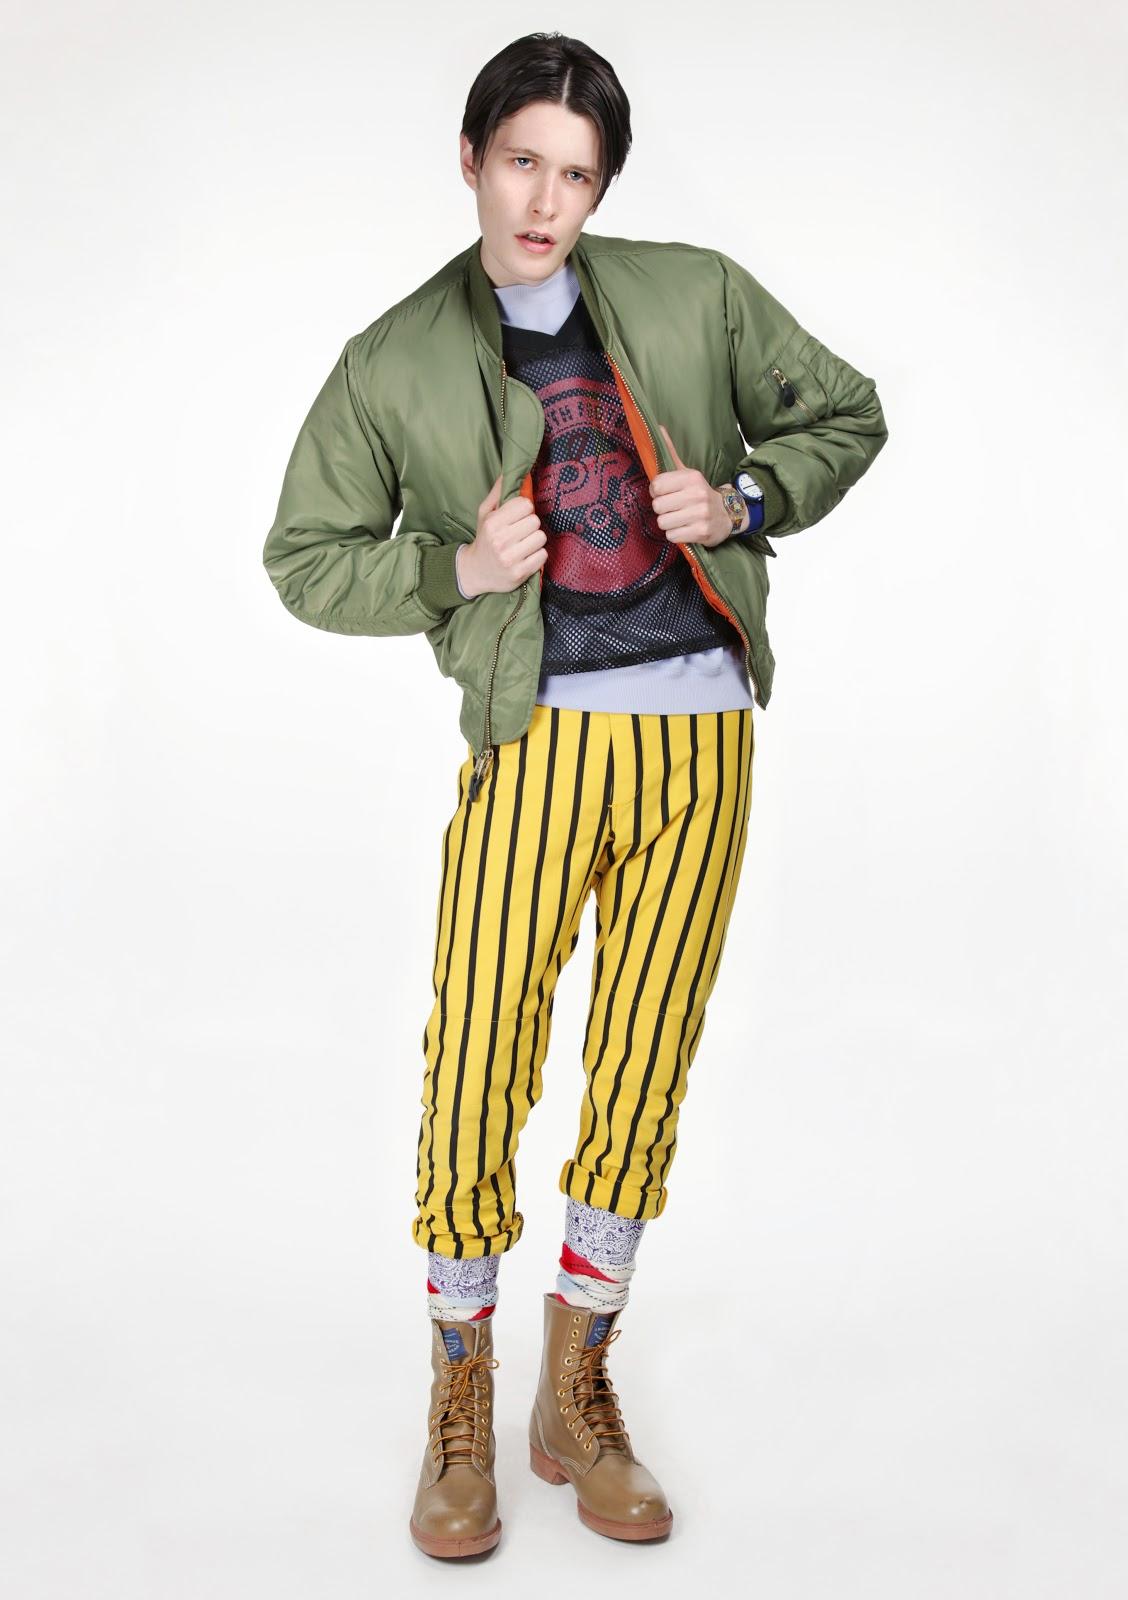 90s clothes for men